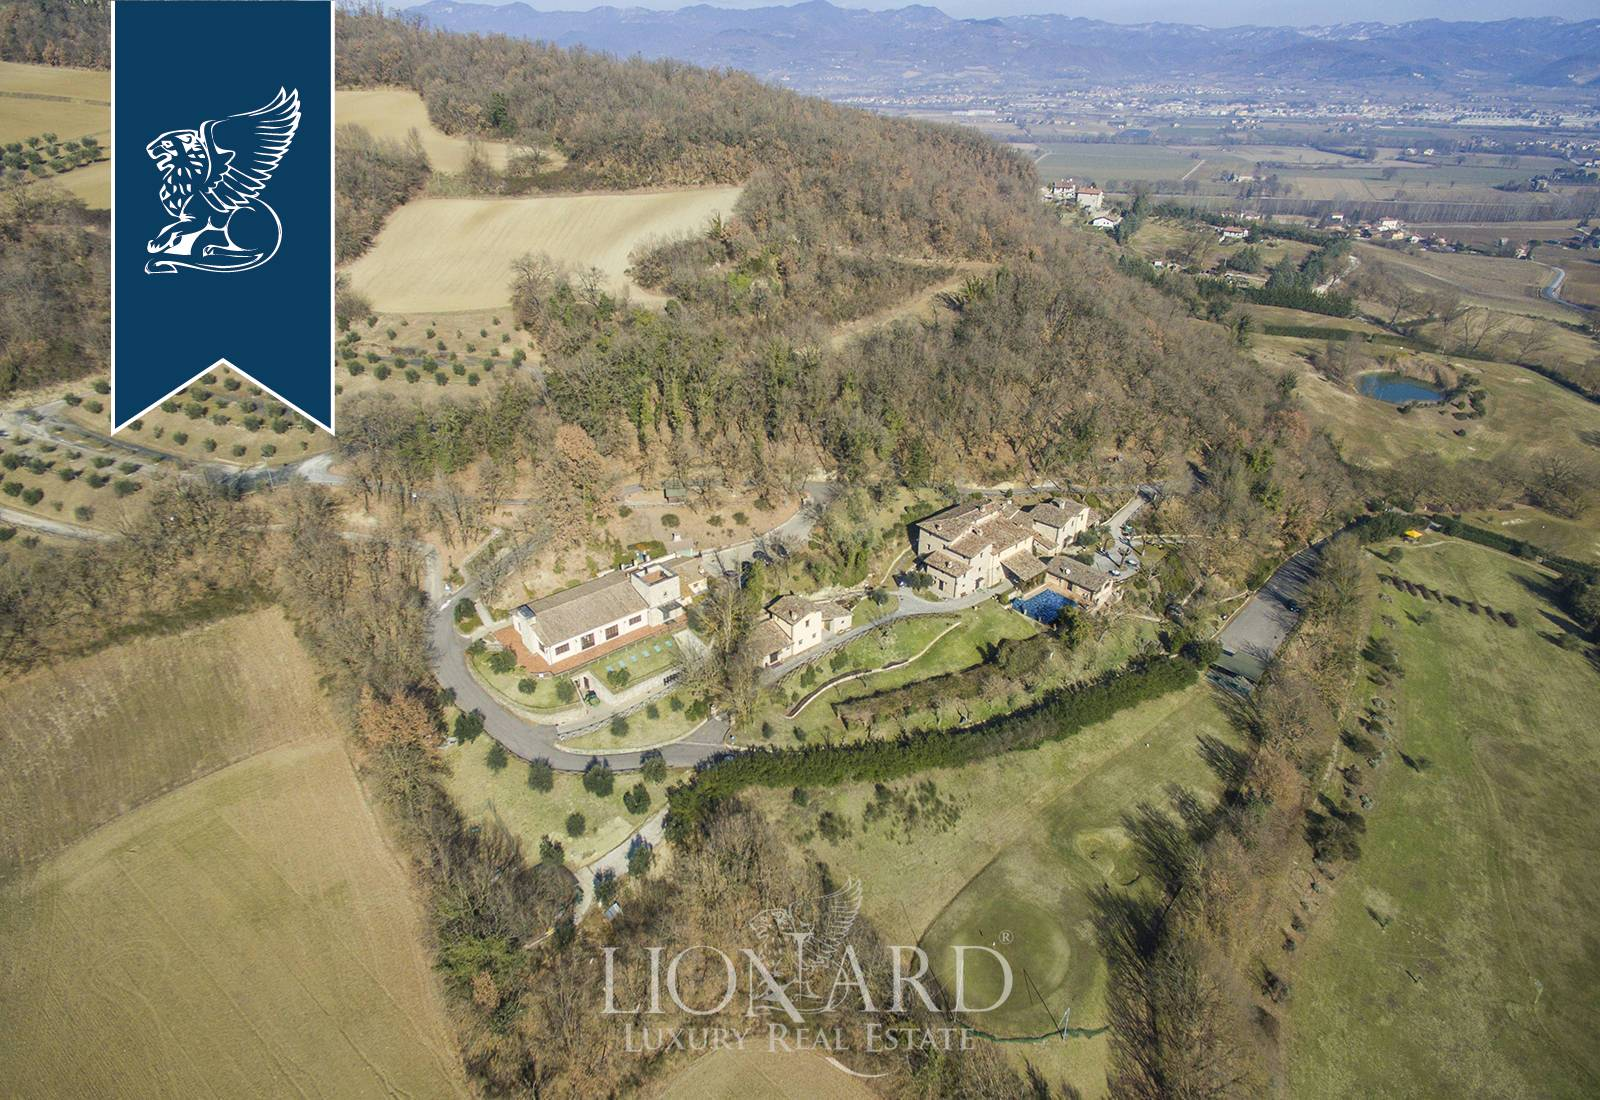 Agriturismo in Vendita a Citta' Di Castello: 0 locali, 1500 mq - Foto 8